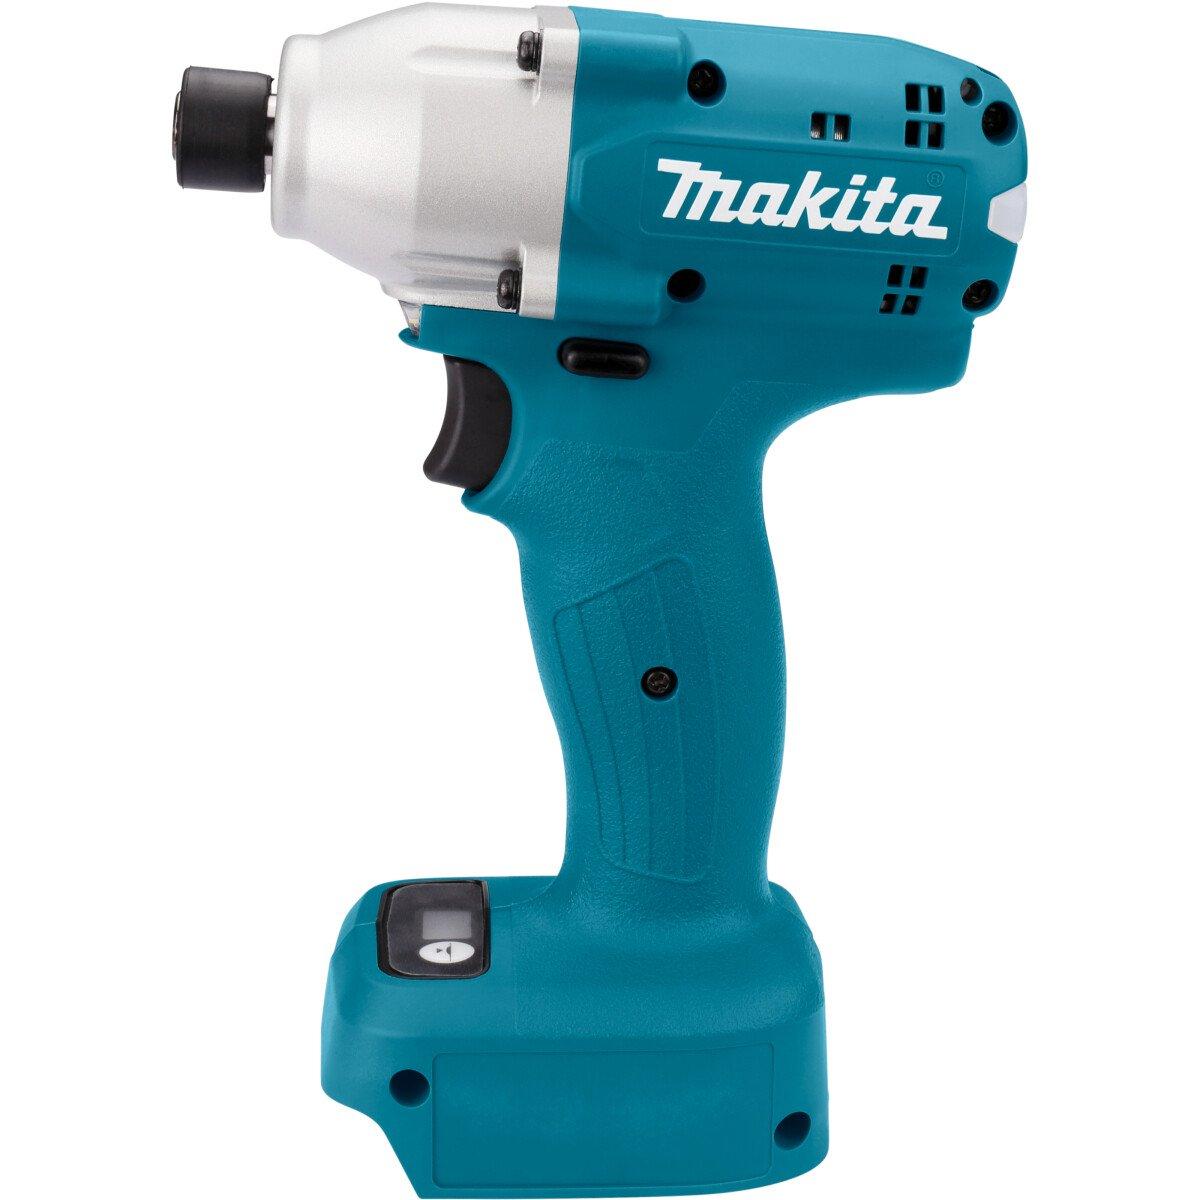 Makita DTDA140Z 14.4v Body Only Brushless Impact Driver